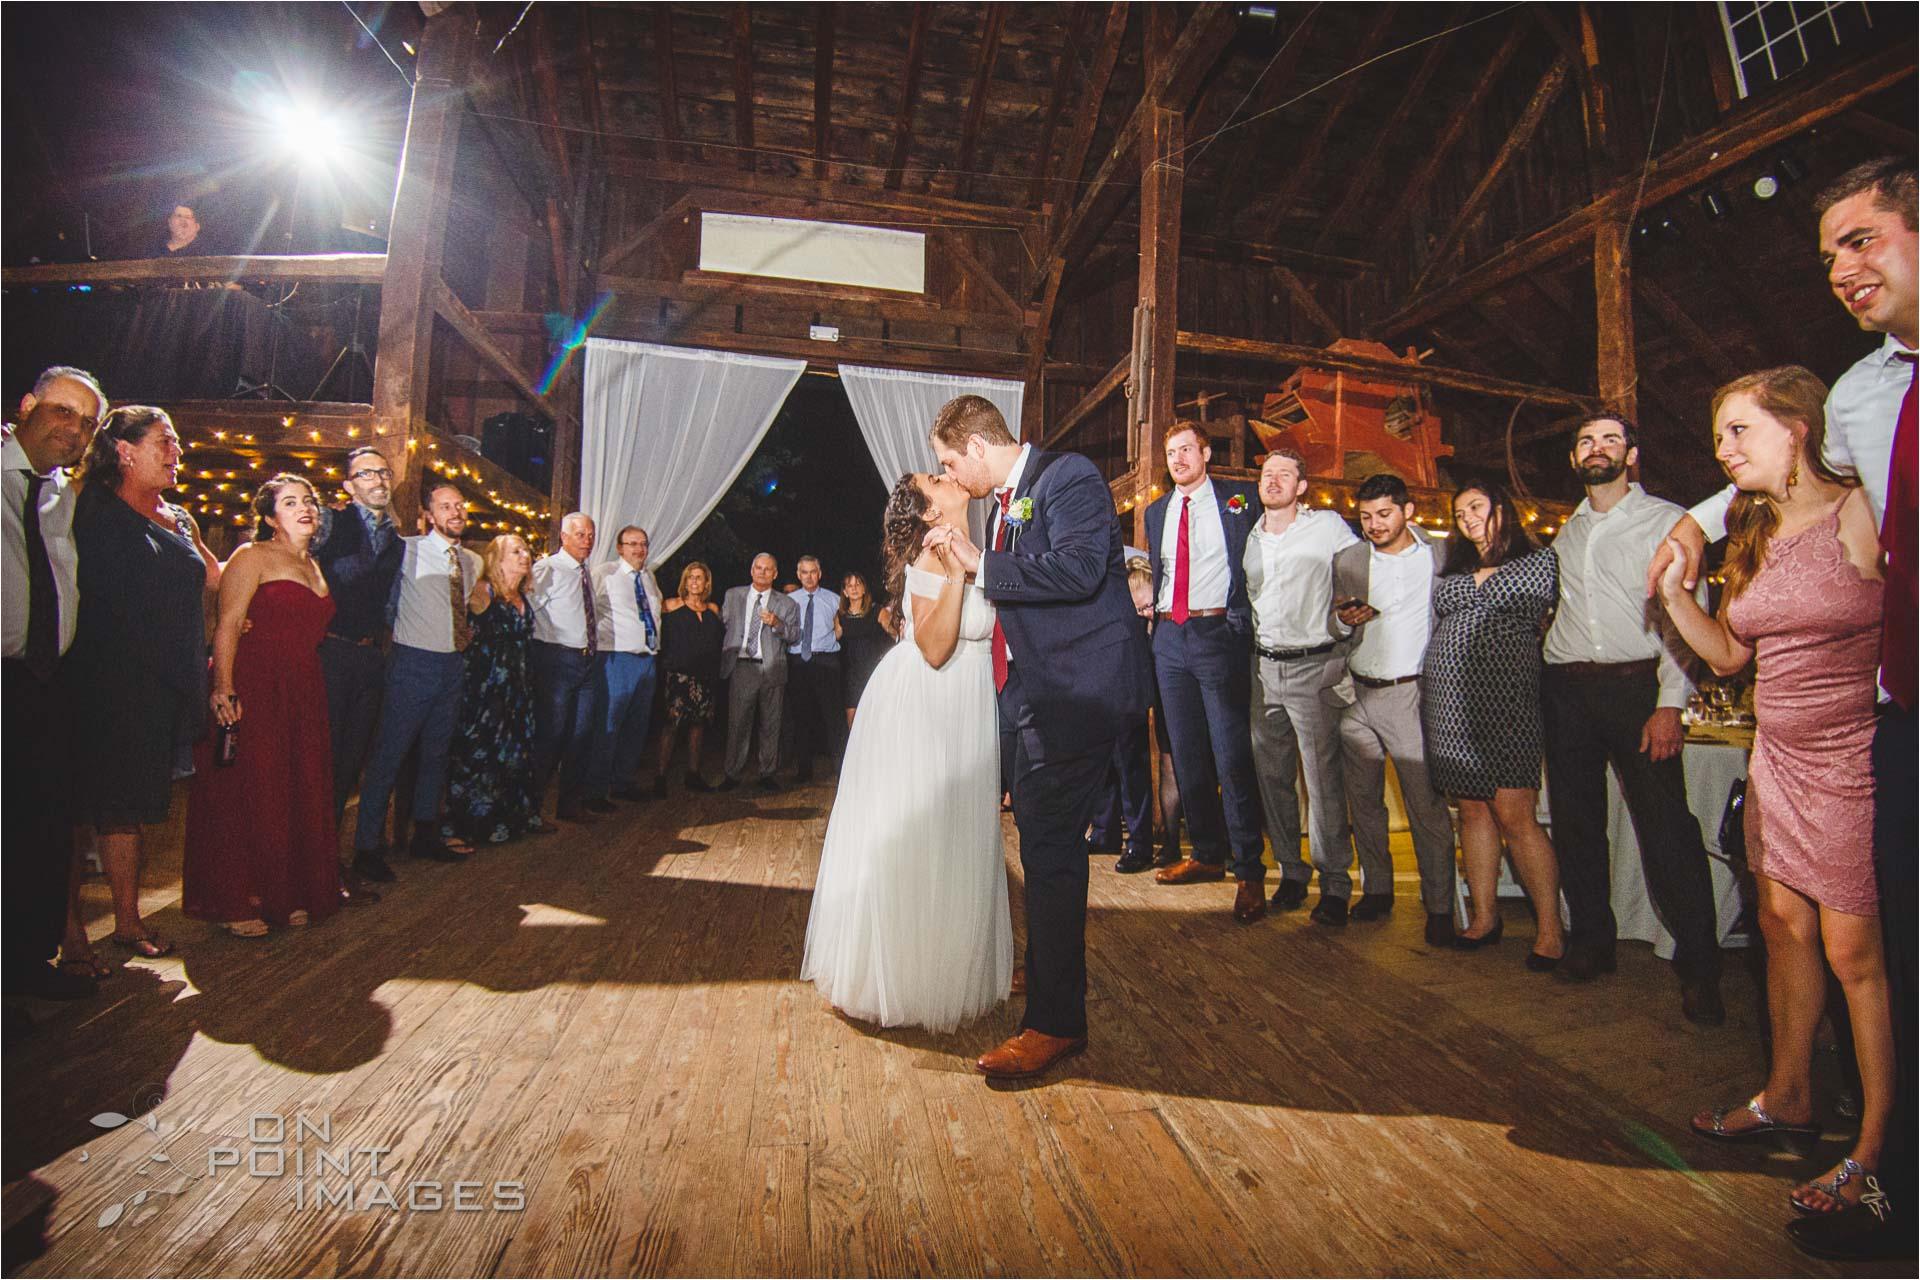 webb-barn-wedding-photography-silas-robbins-house-01.jpg